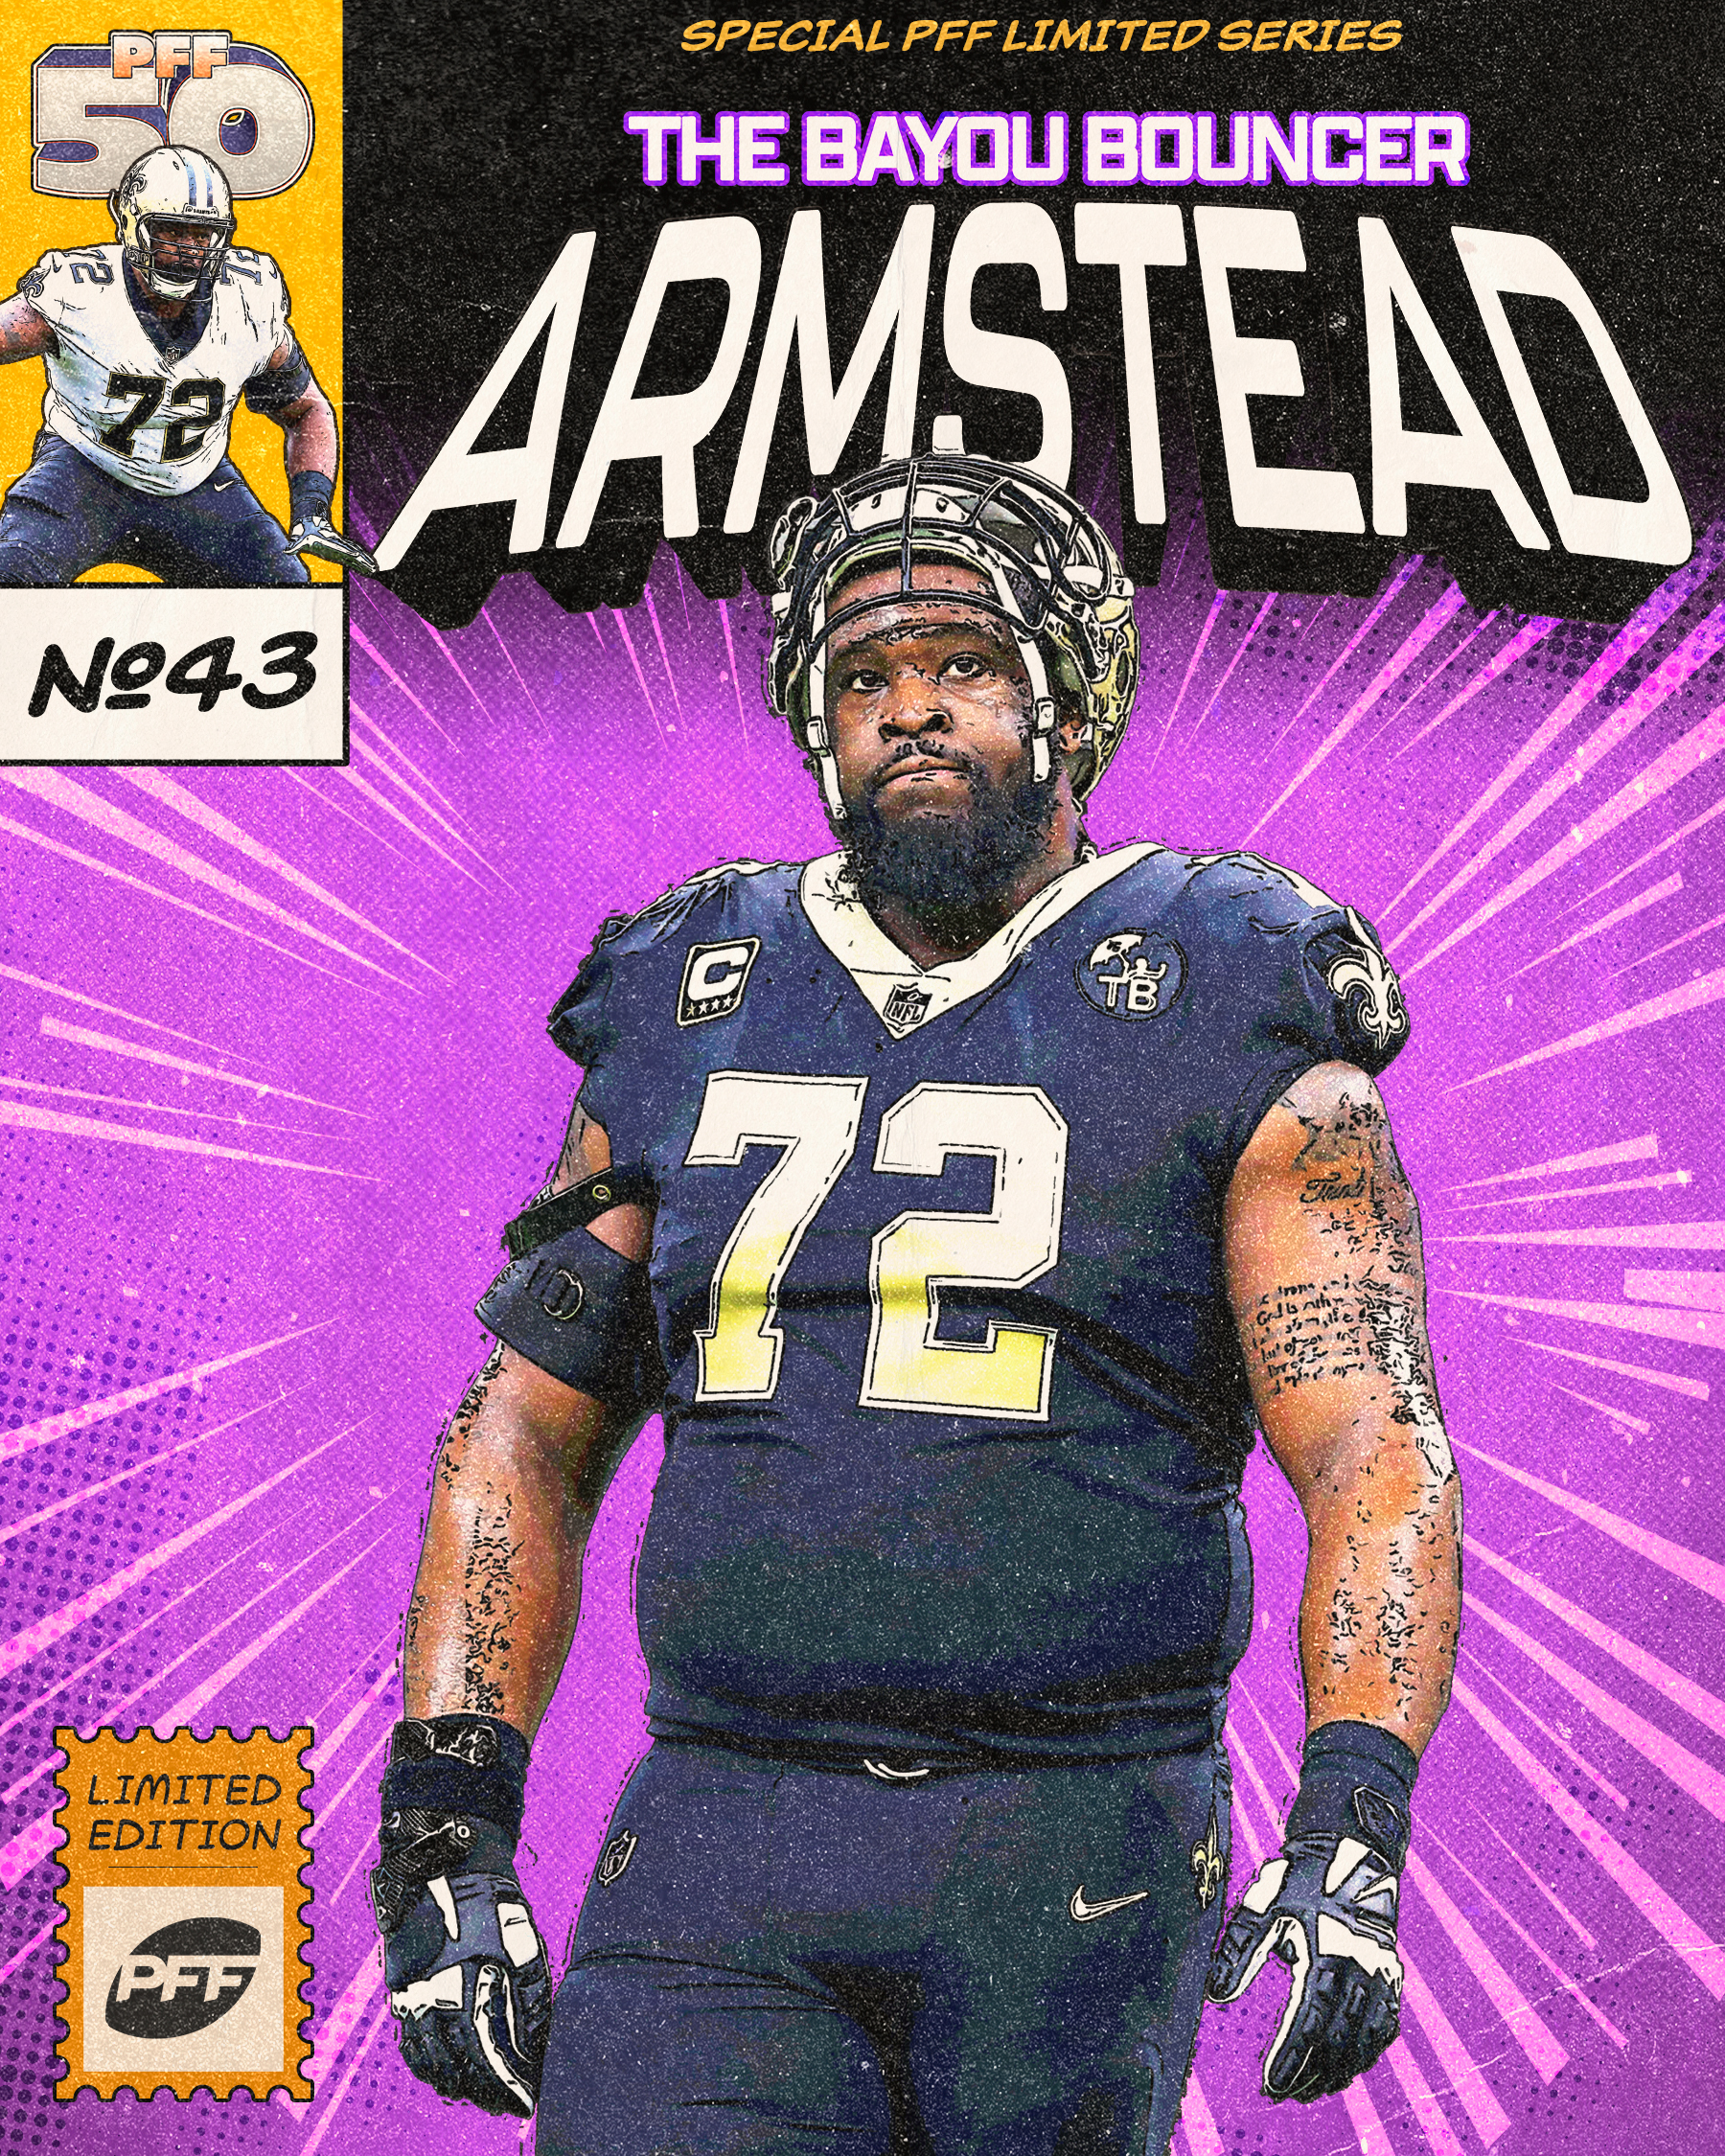 New Orleans Saints left tackle Terron Armstead